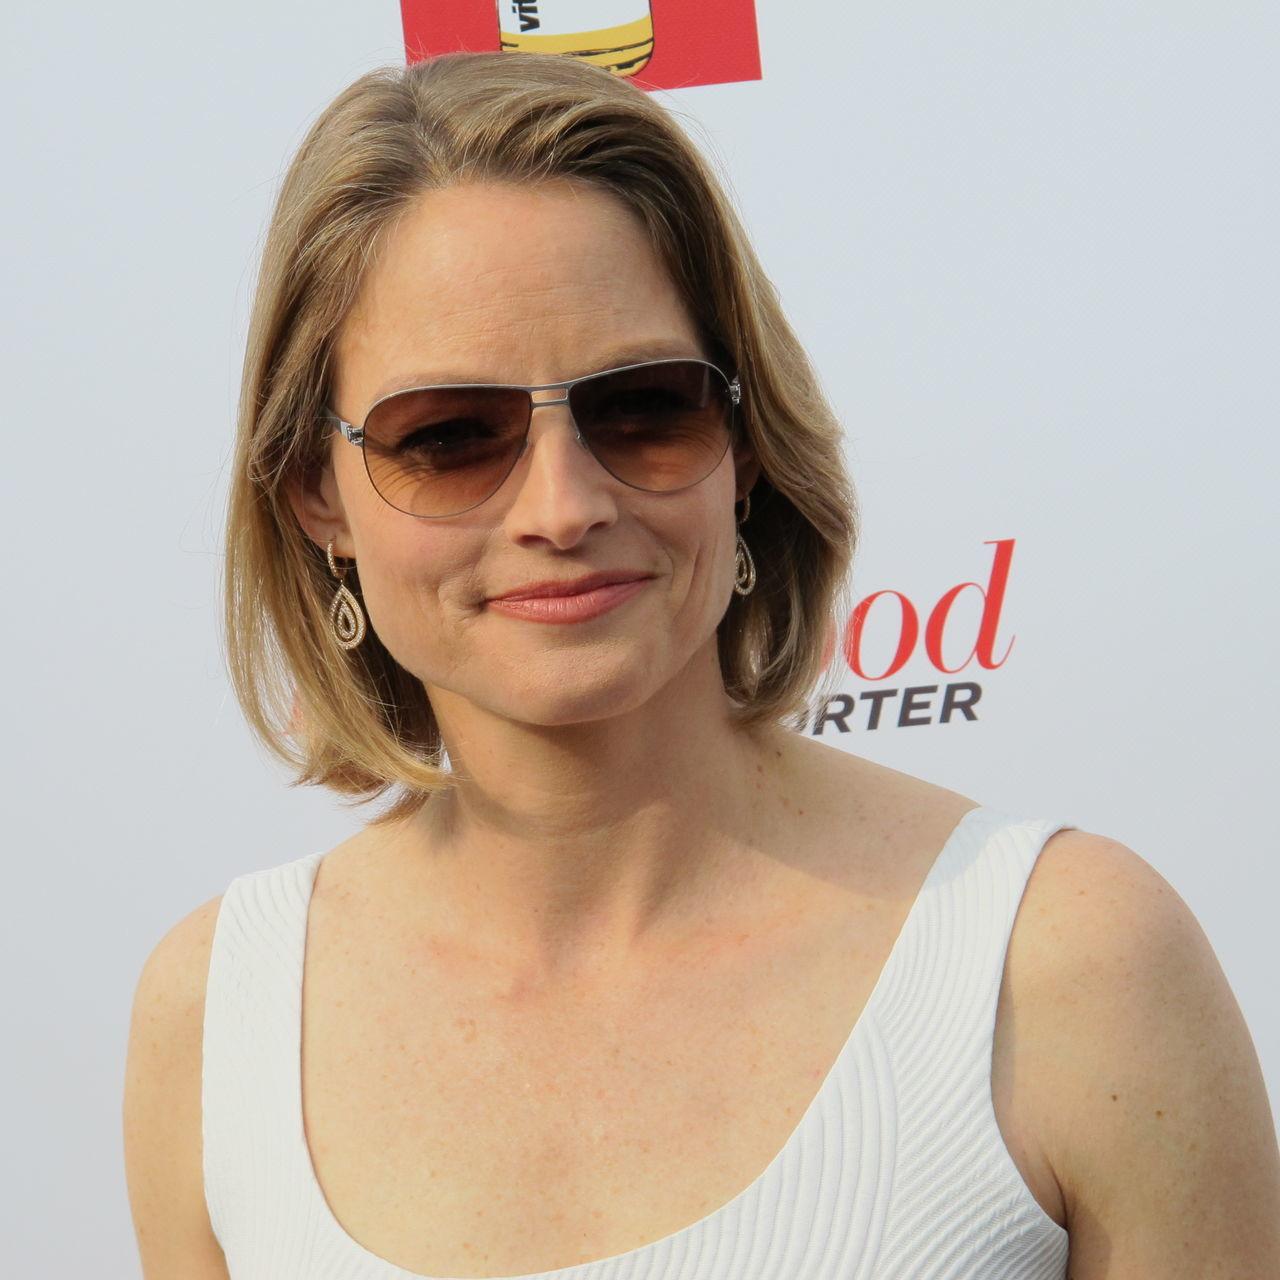 Cannes Film Festival 2011 Jodie Foster Portrait